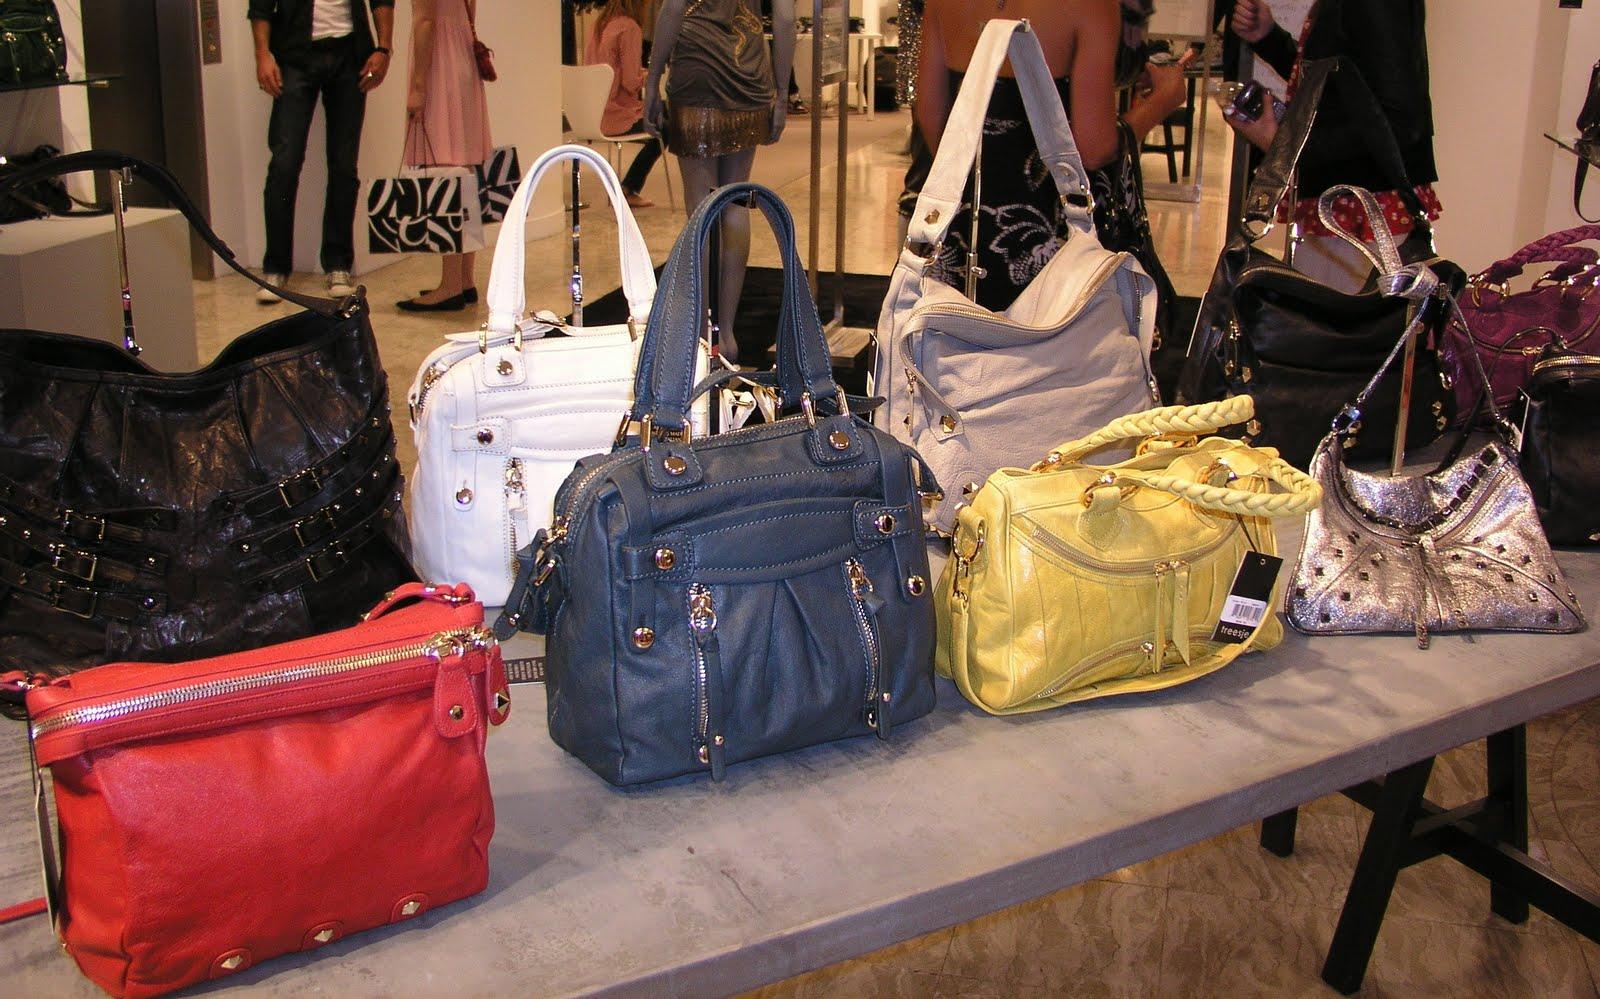 21487c1b0e72 Treesje Handbags  Why Celebrities Carry Them and Love Them